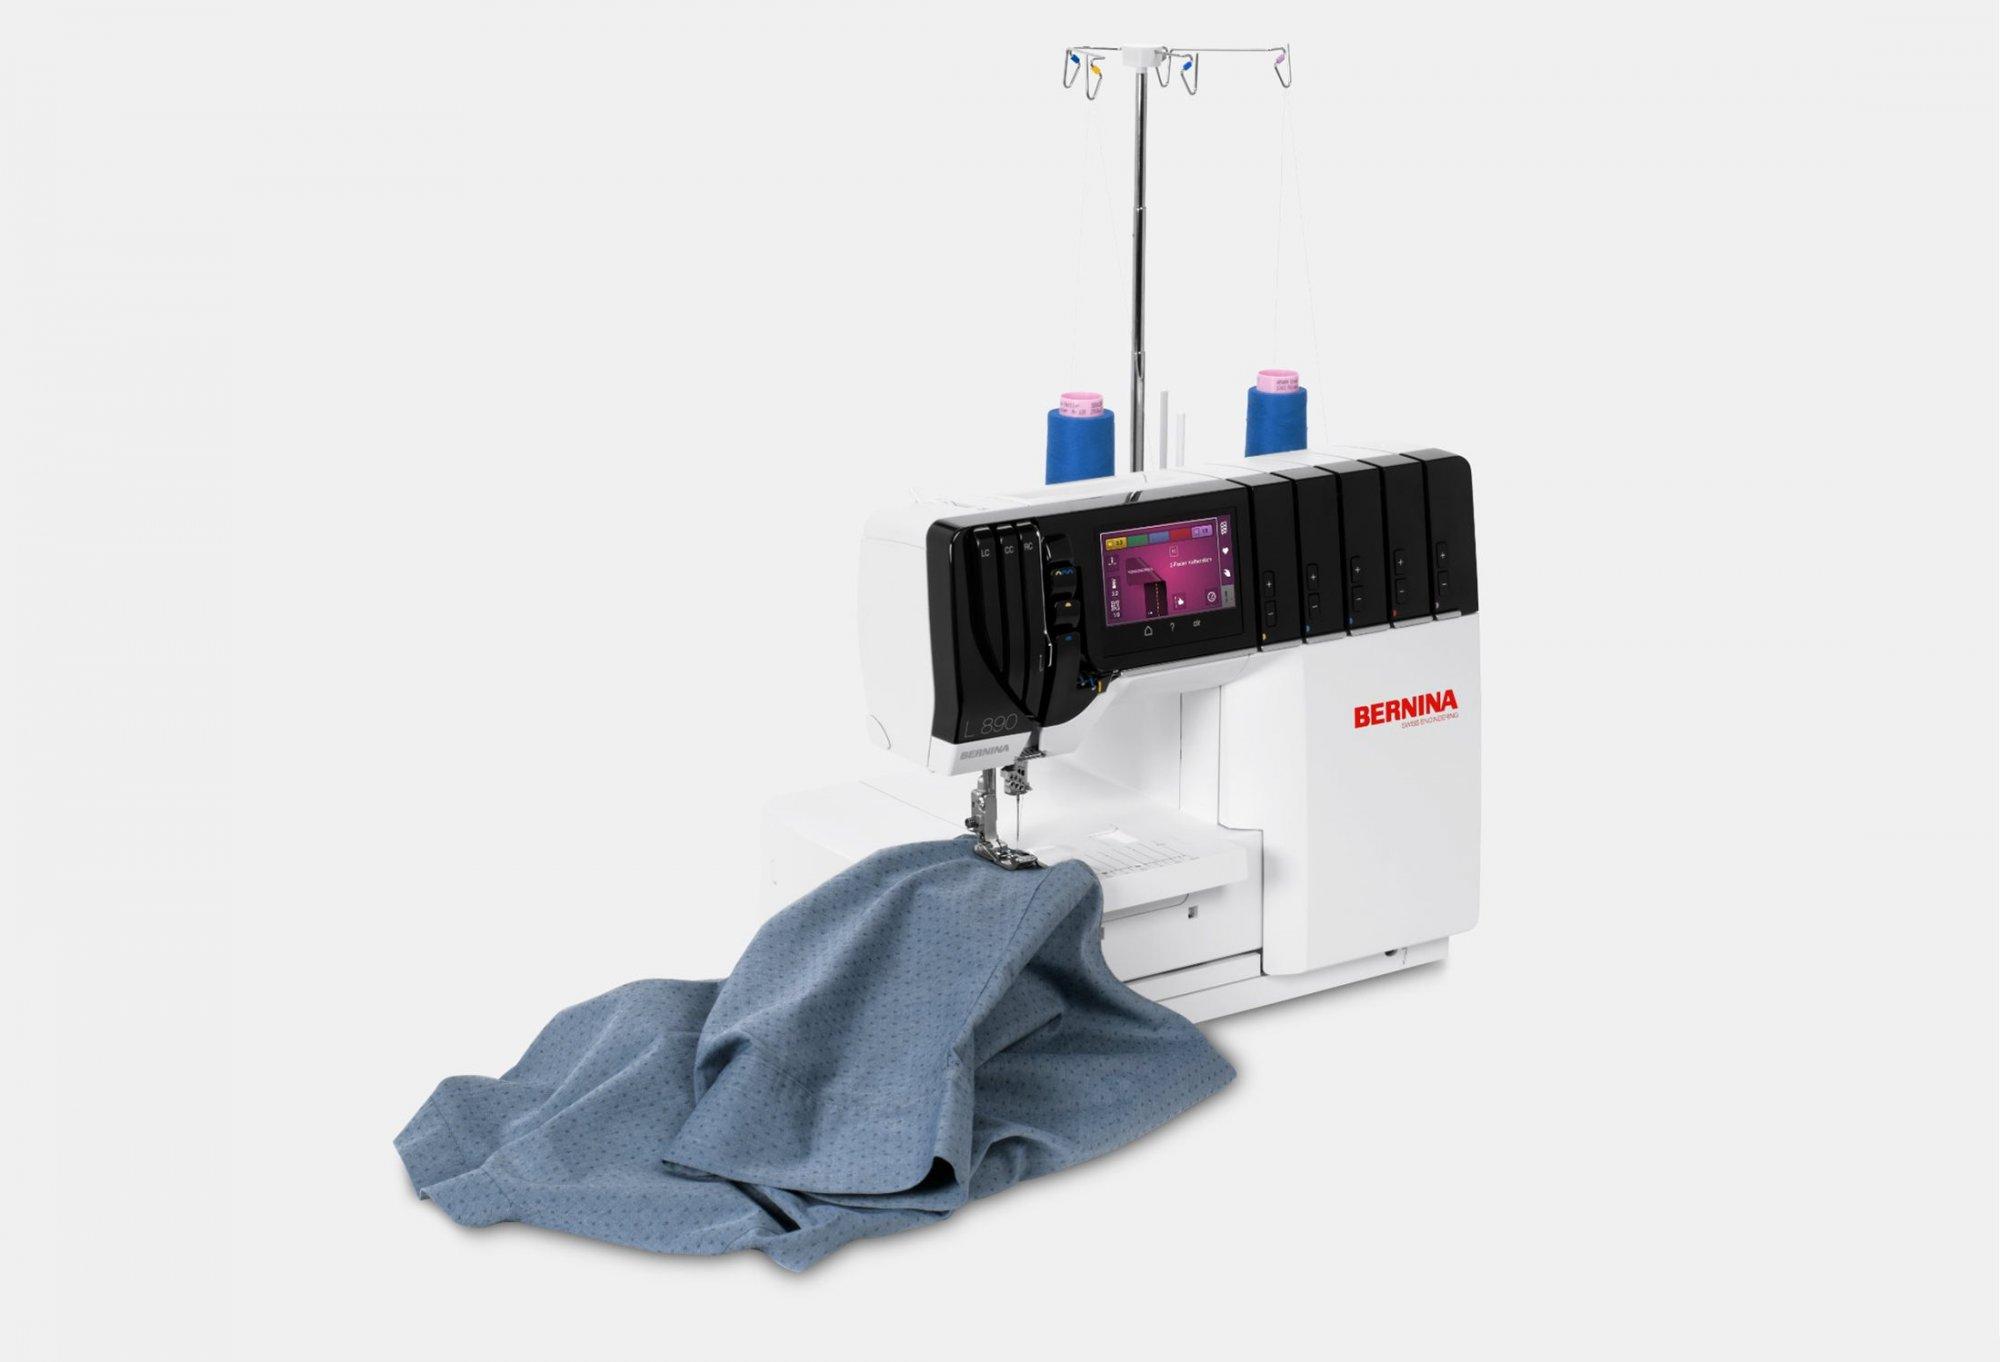 BERNINA Machine L890 Overlock and Coverstitching